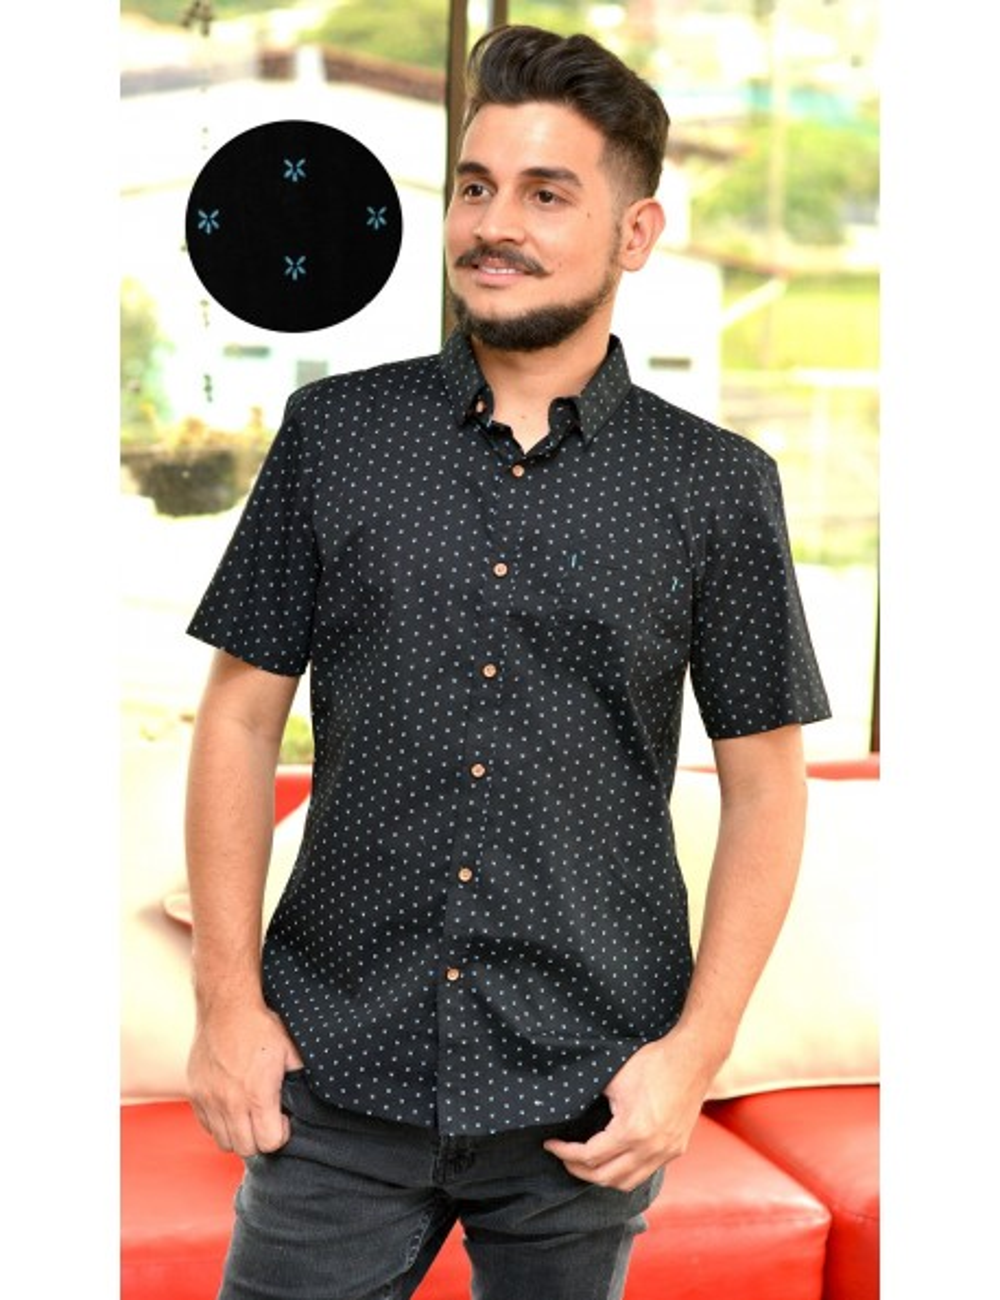 Camisa negra manga corta con estampado celeste